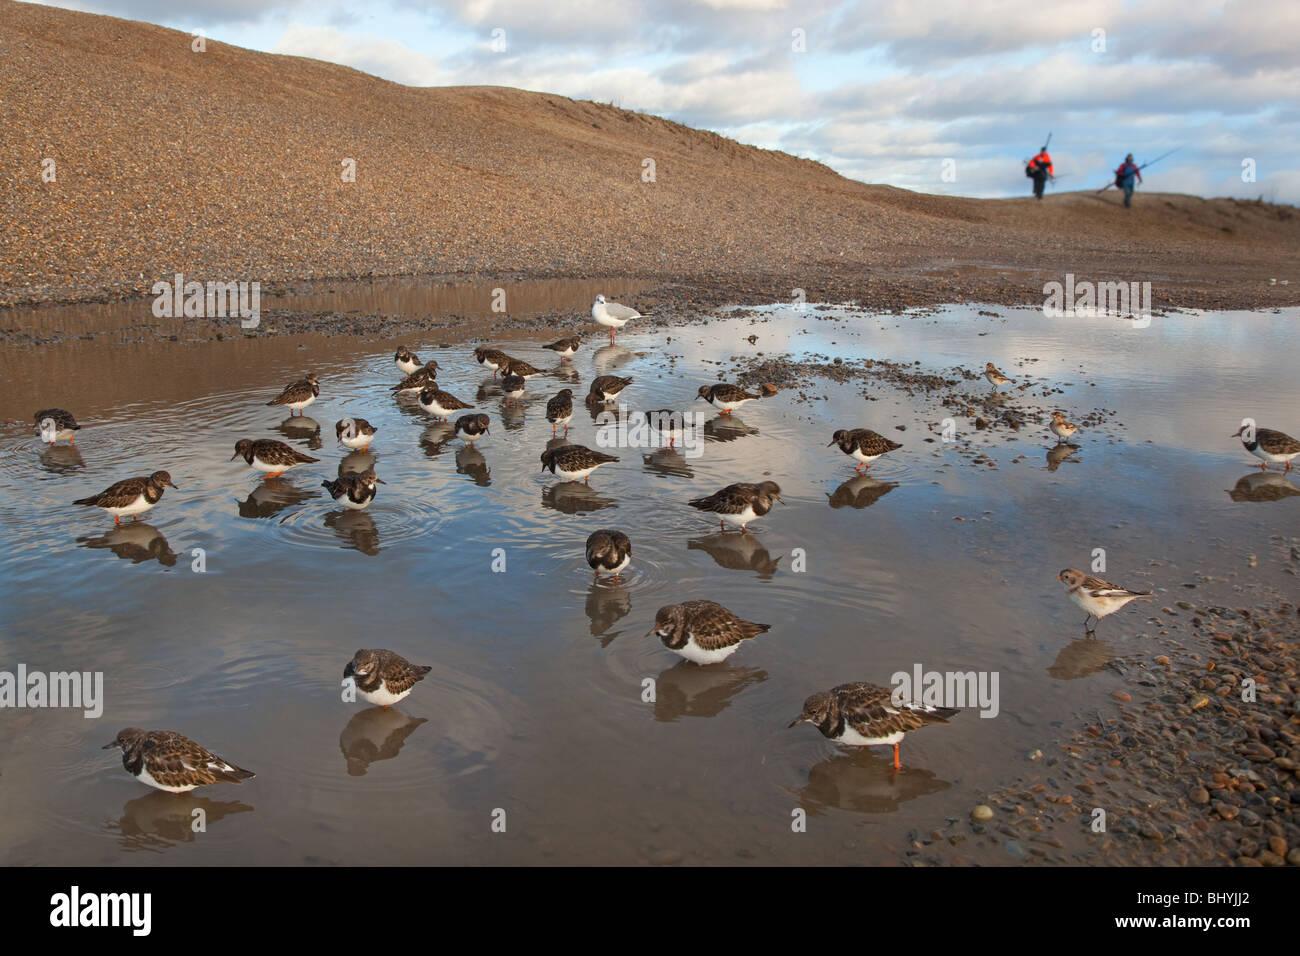 Turnstones Arenaria interpres feeding in pool behind the shingle sea wall - Stock Image